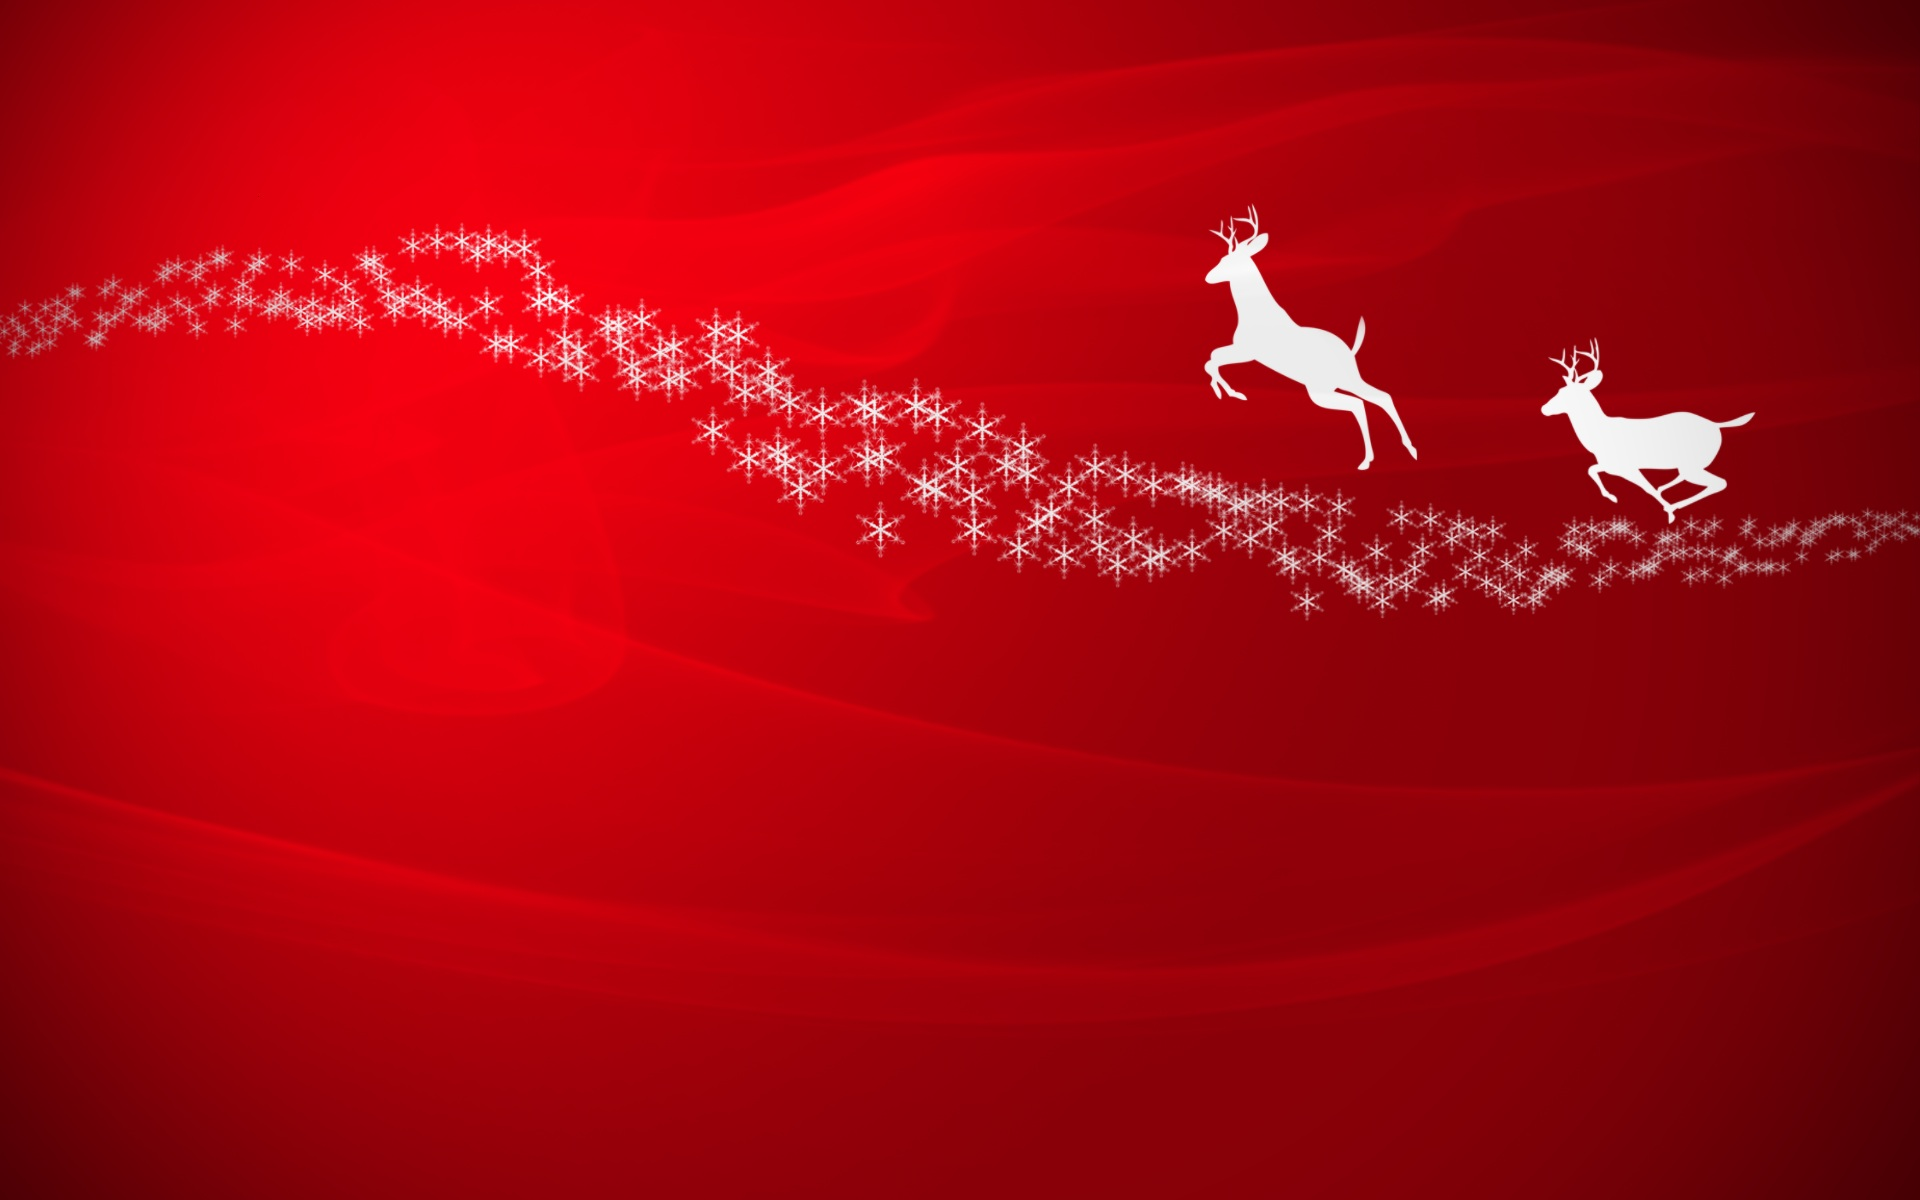 Windows 7 Christmas Theme wallpaper 1920x1200